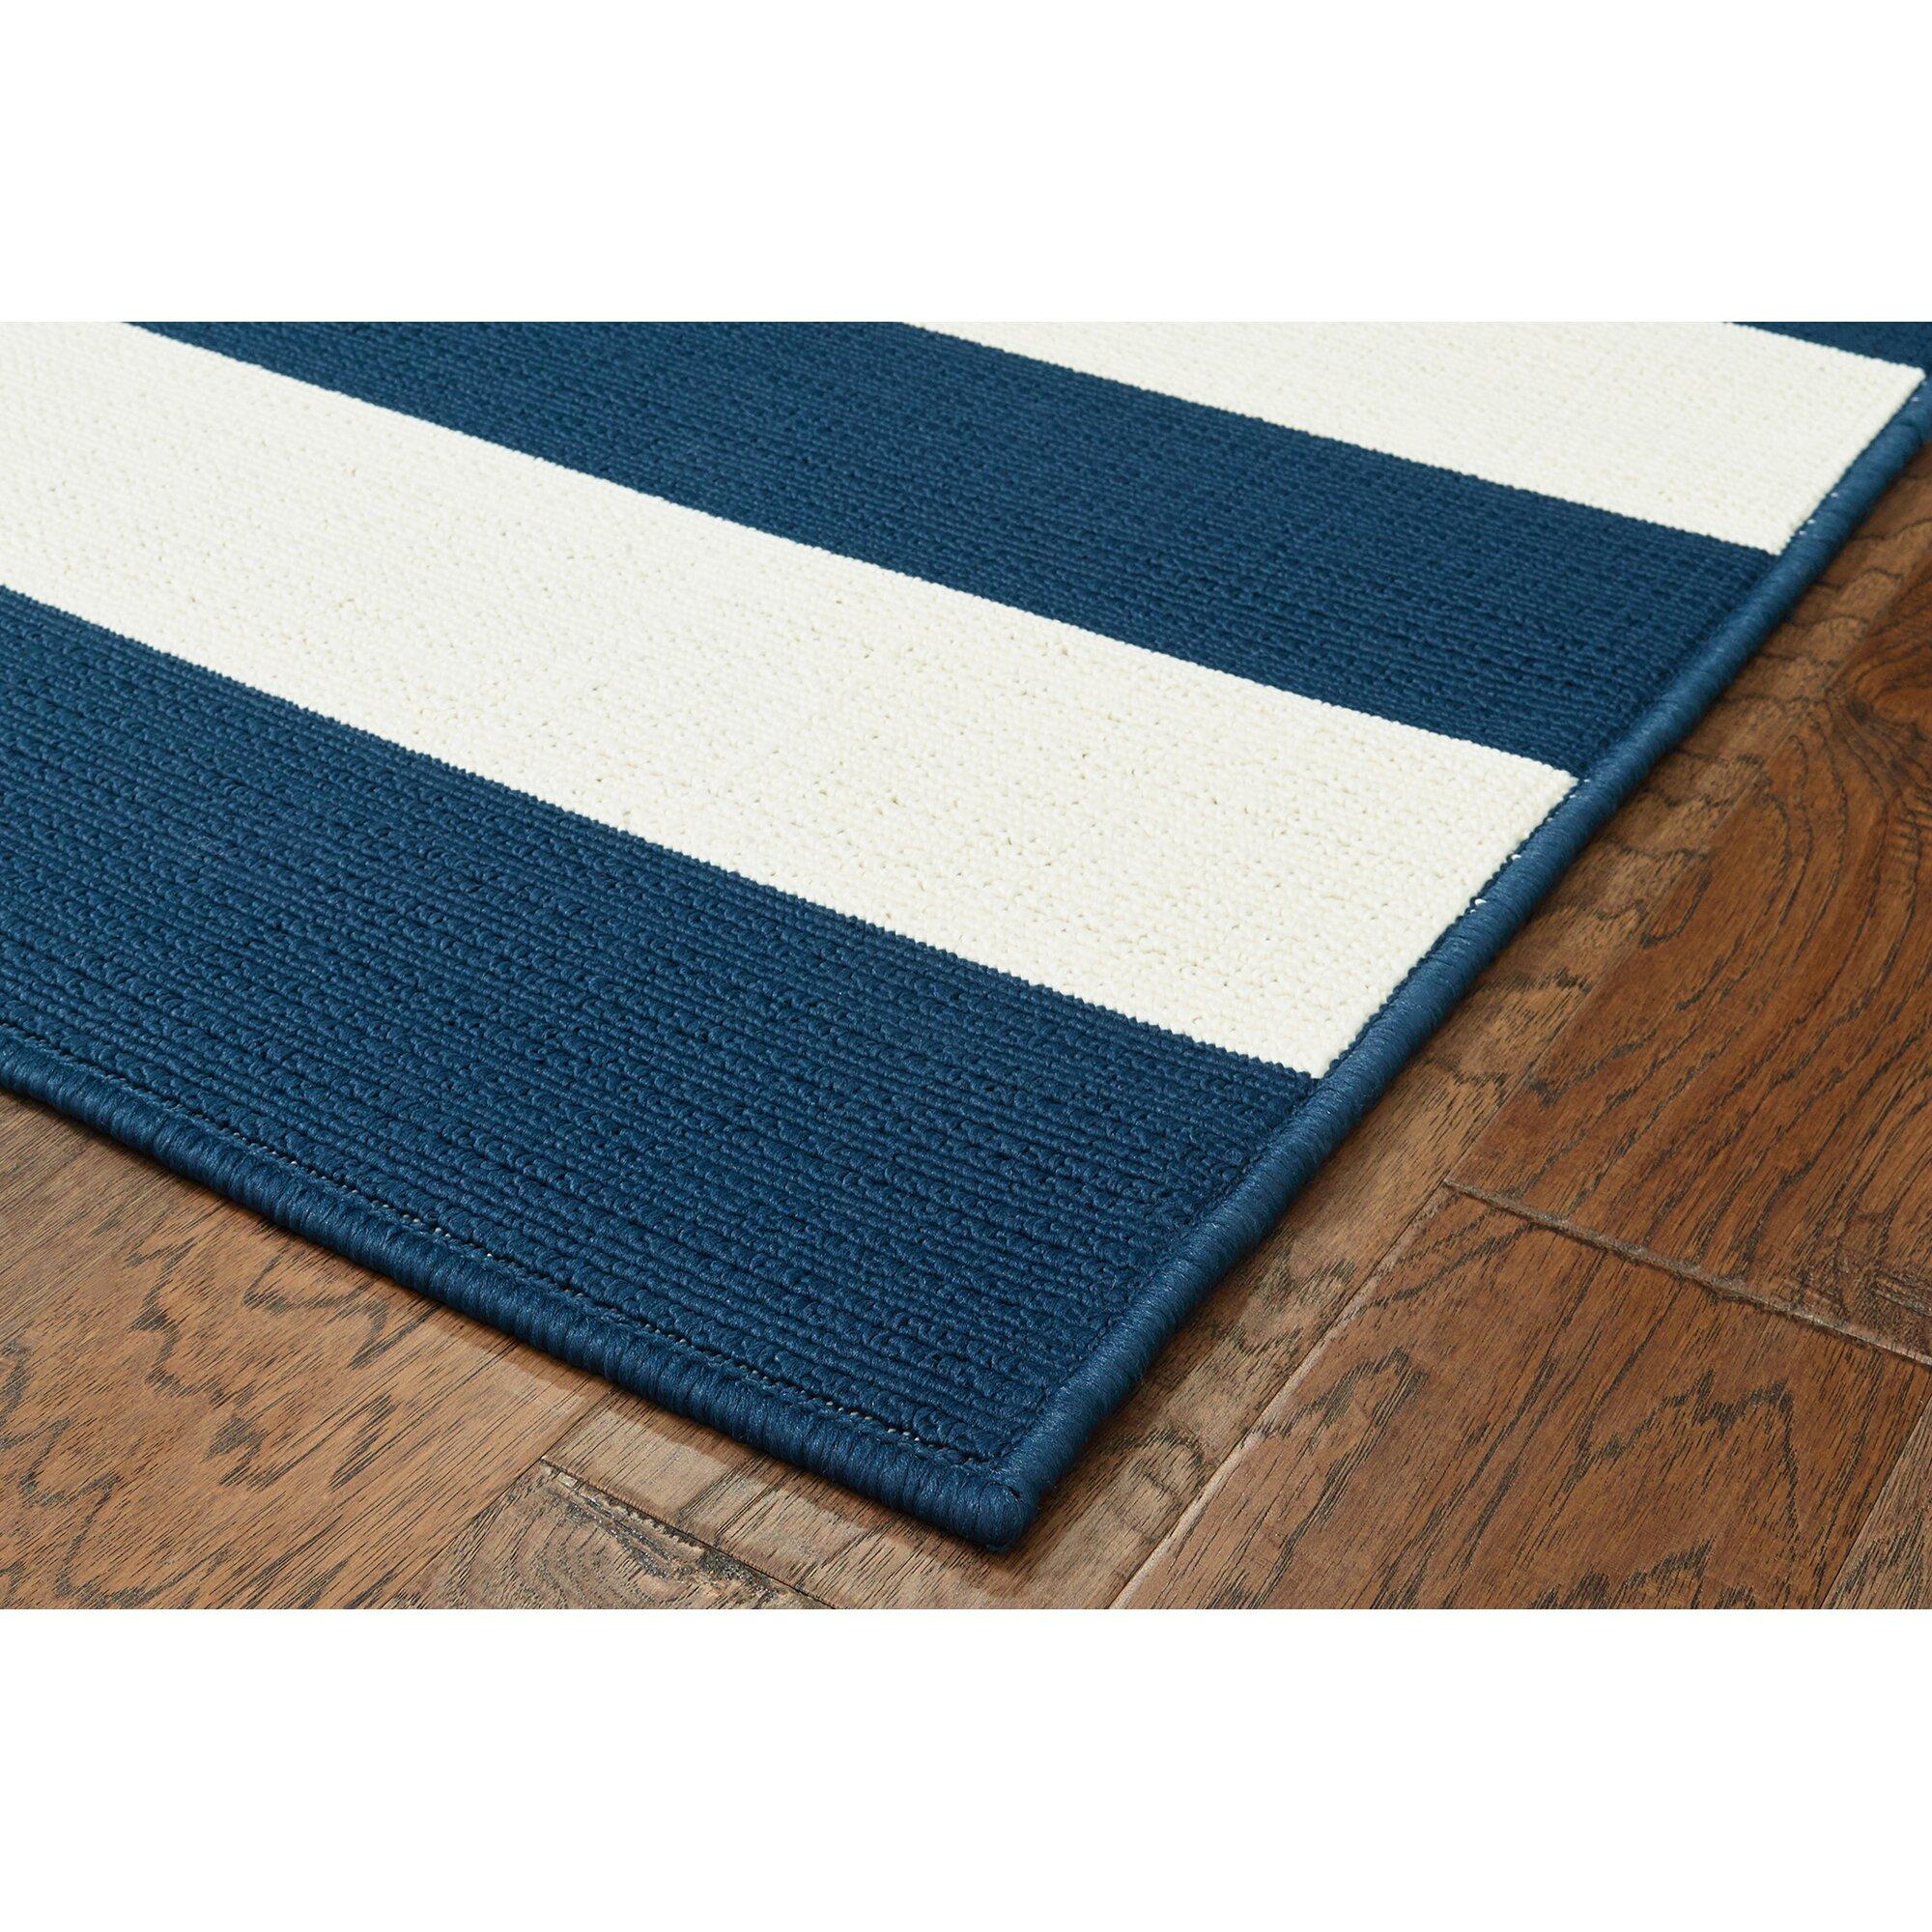 breakwater bay henley stripe navy white indoor outdoor area rug reviews. Black Bedroom Furniture Sets. Home Design Ideas